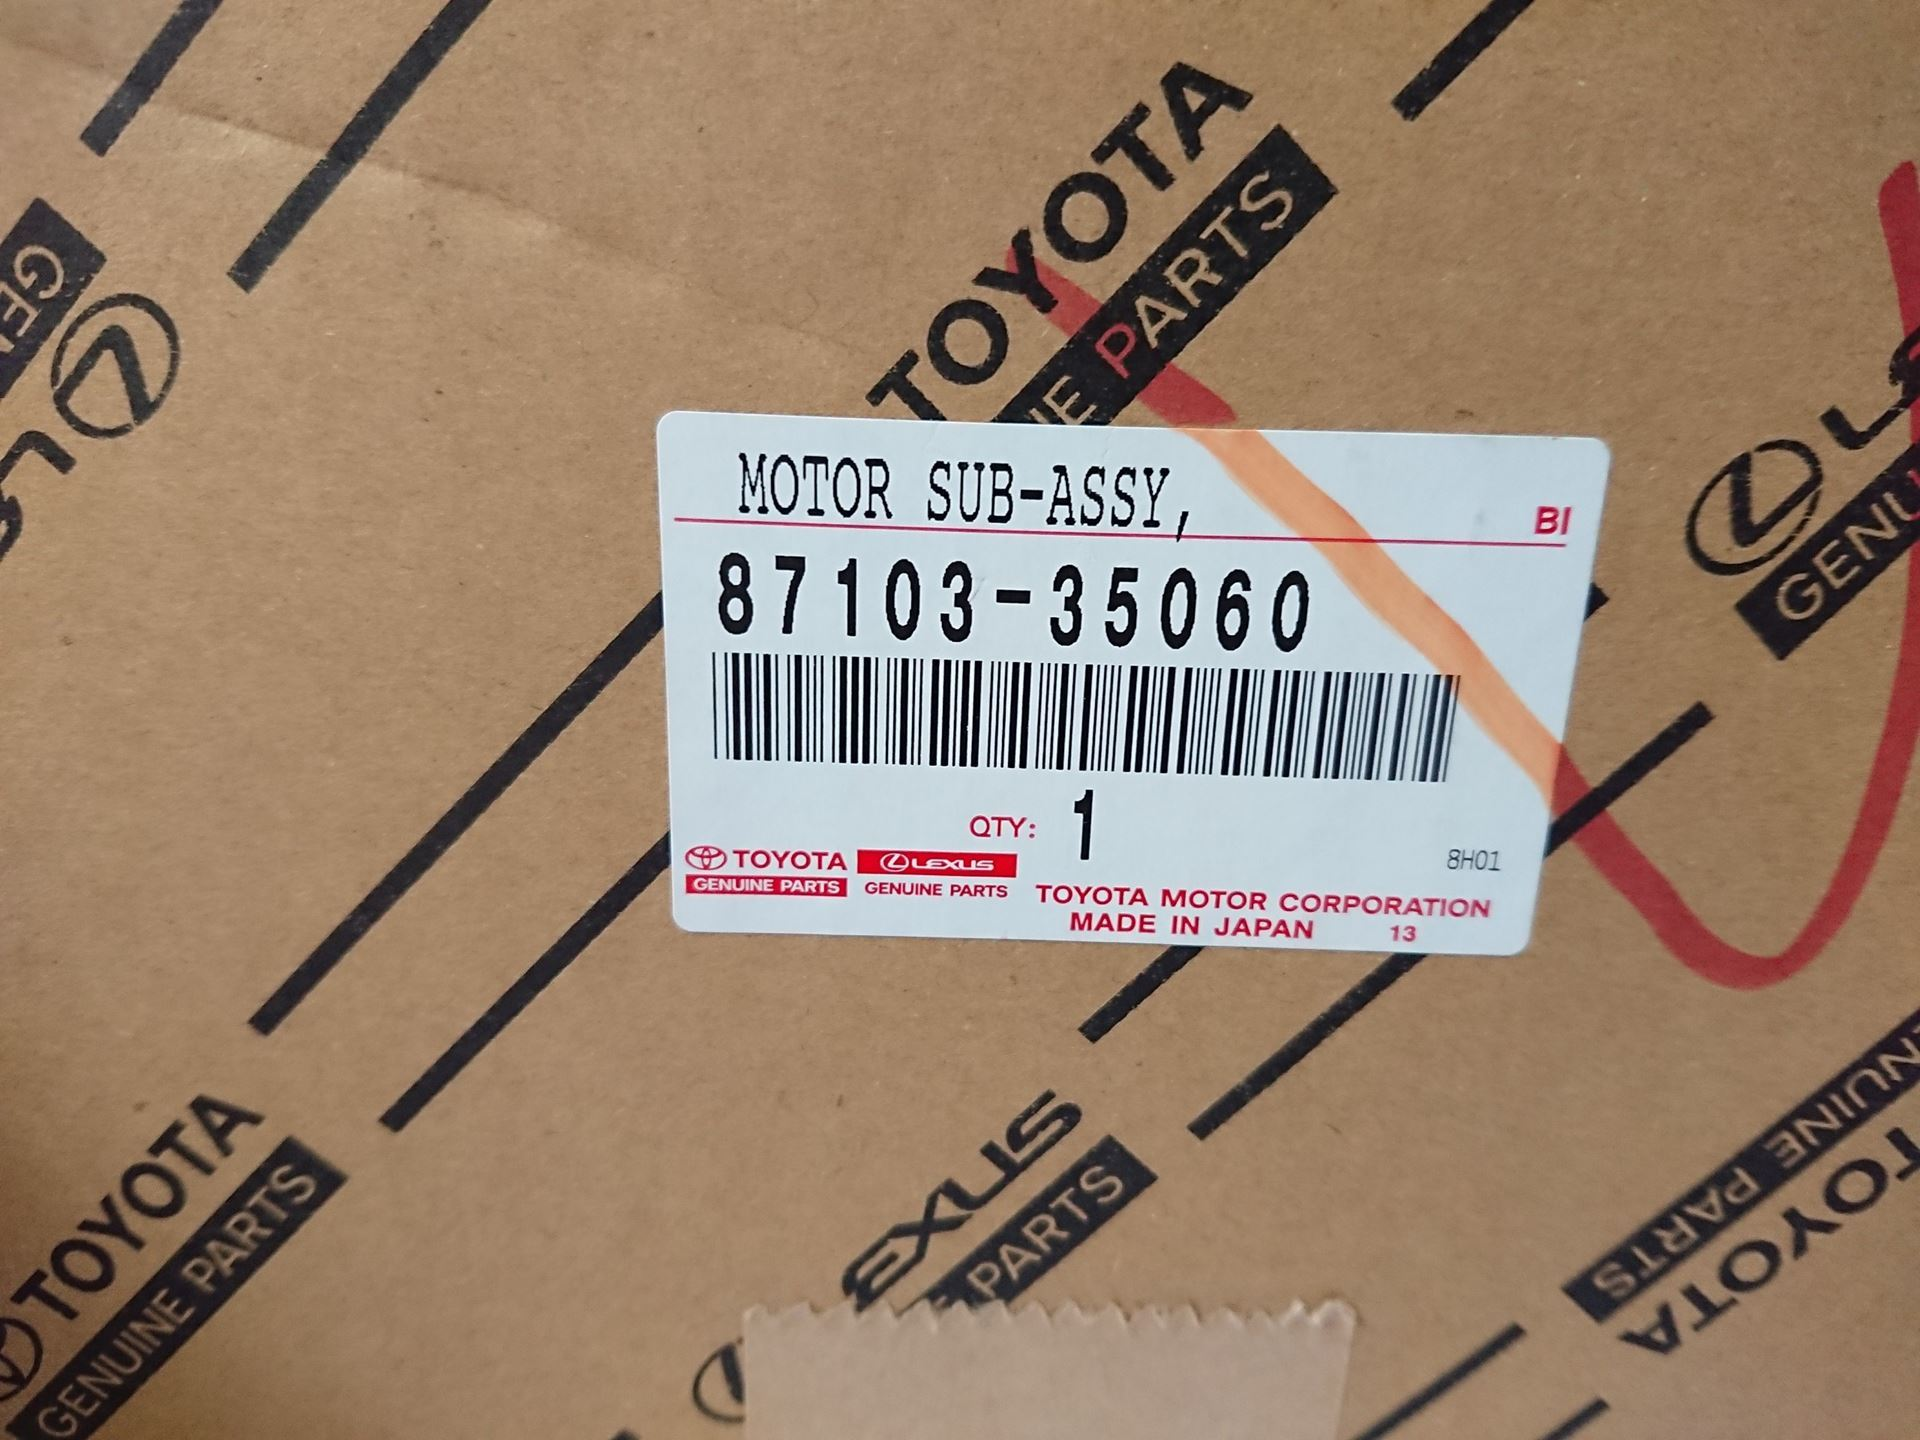 Picture of 87103-35060, 87103-35040, 87103-35041 Quạt điều hòa, quạt giàn lạnh Lexus GX470, Land Cruiser Prado